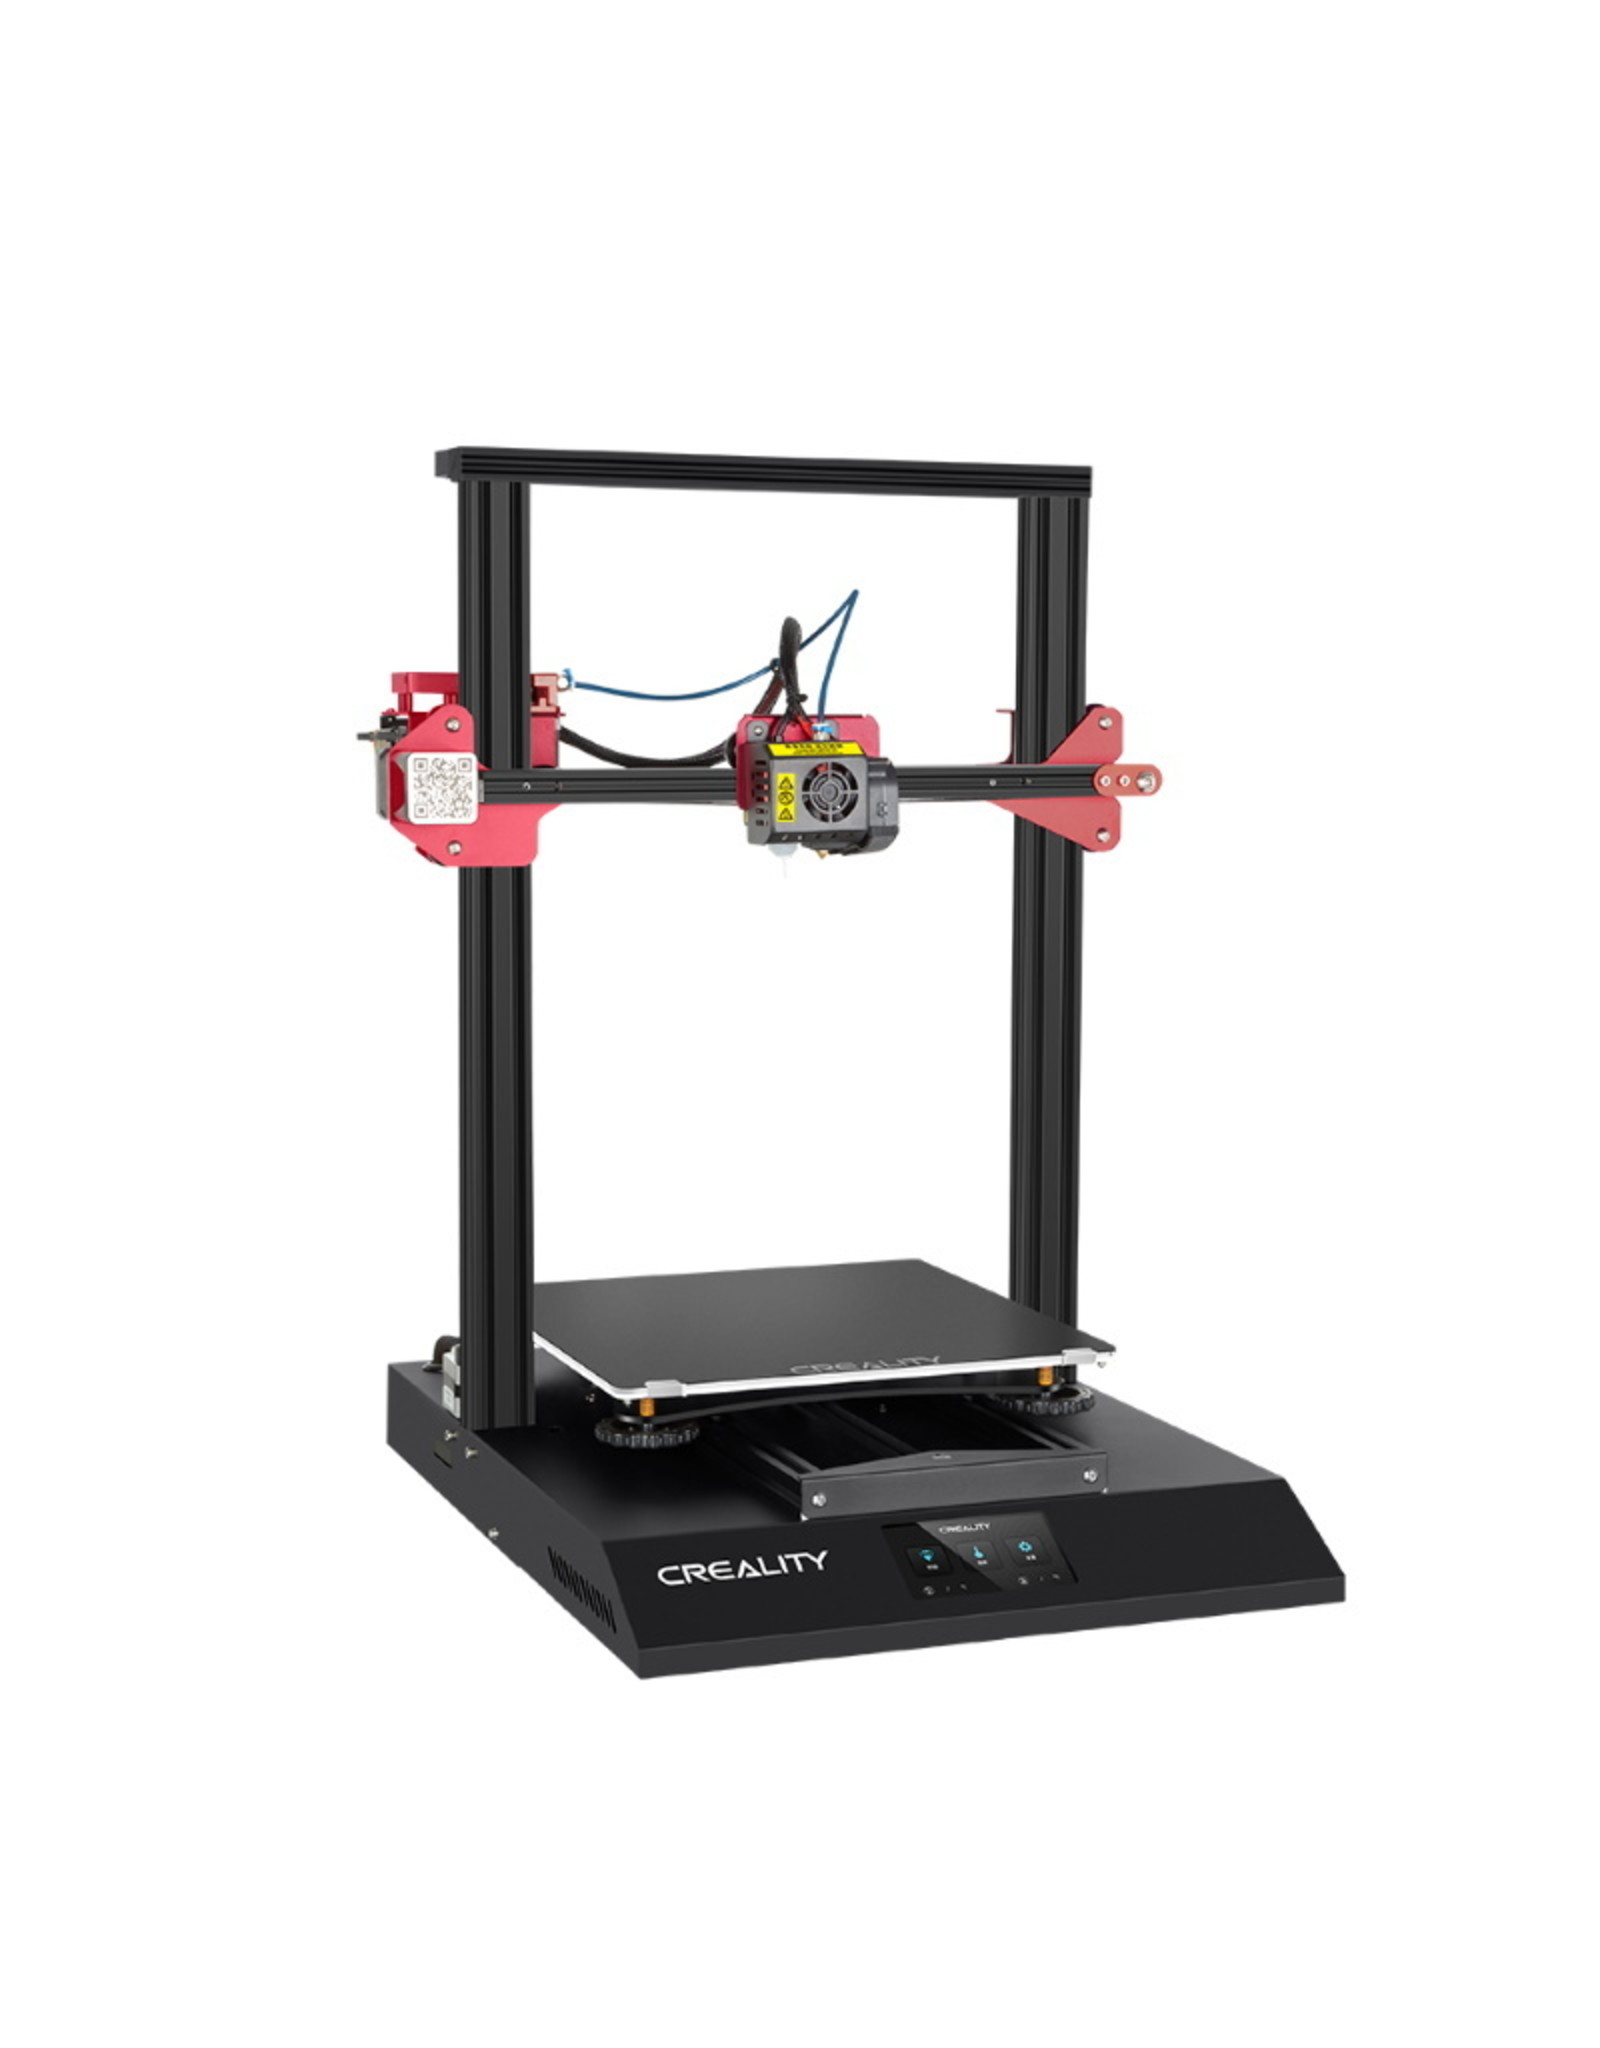 Creality/Ender Creality CR-10S PRO 3D-printer 30x30x40  - Nieuwe versie V2 met Bl Touch